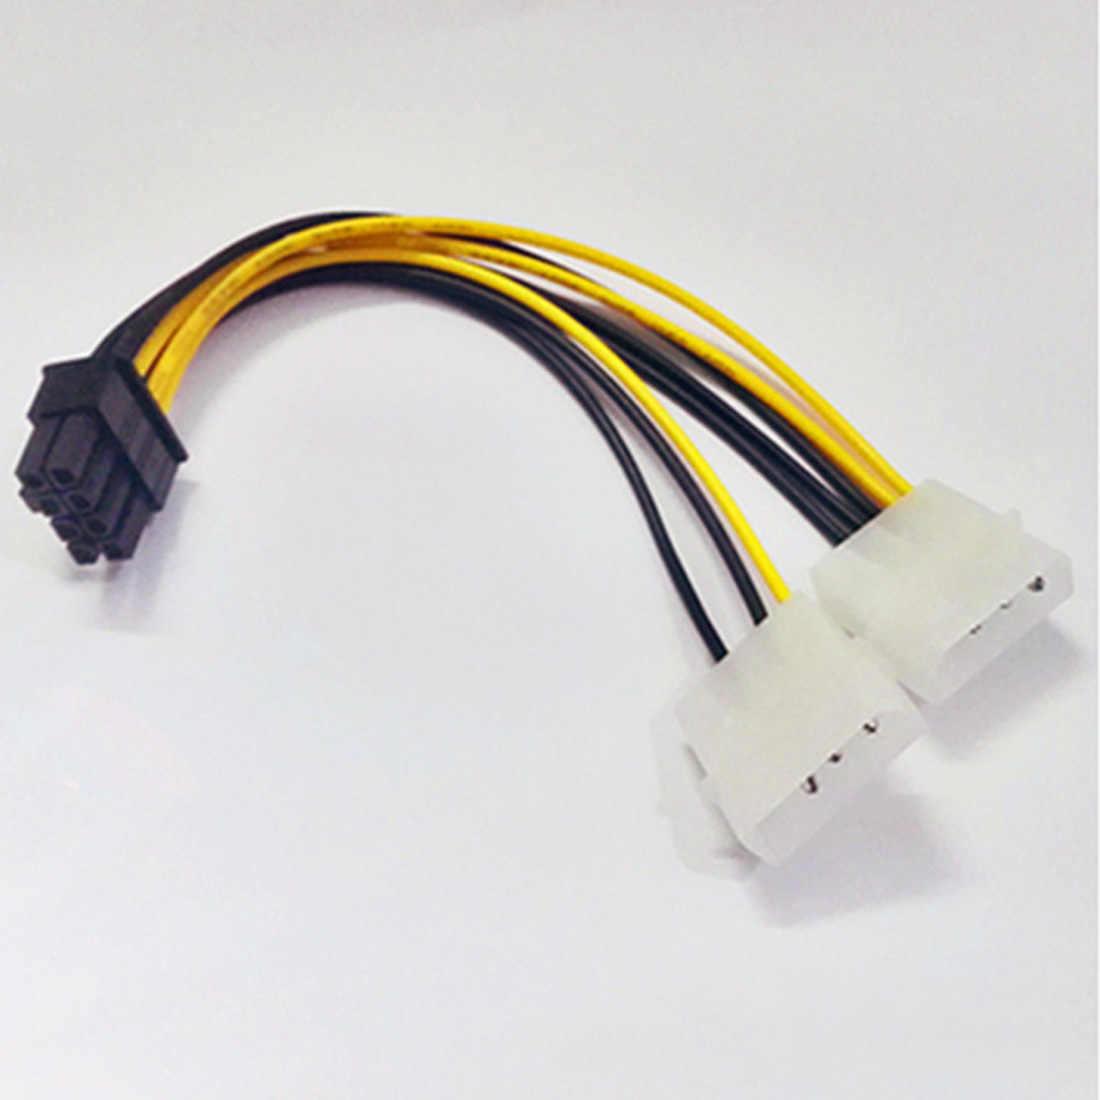 Yeni sıcak 6 inç 2 x Molex 4 pin 8-Pin PCI Express Video kartı Pci-e ATX PSU güç dönüştürücü kablosu-Molex Pcie 8 pin adaptörü